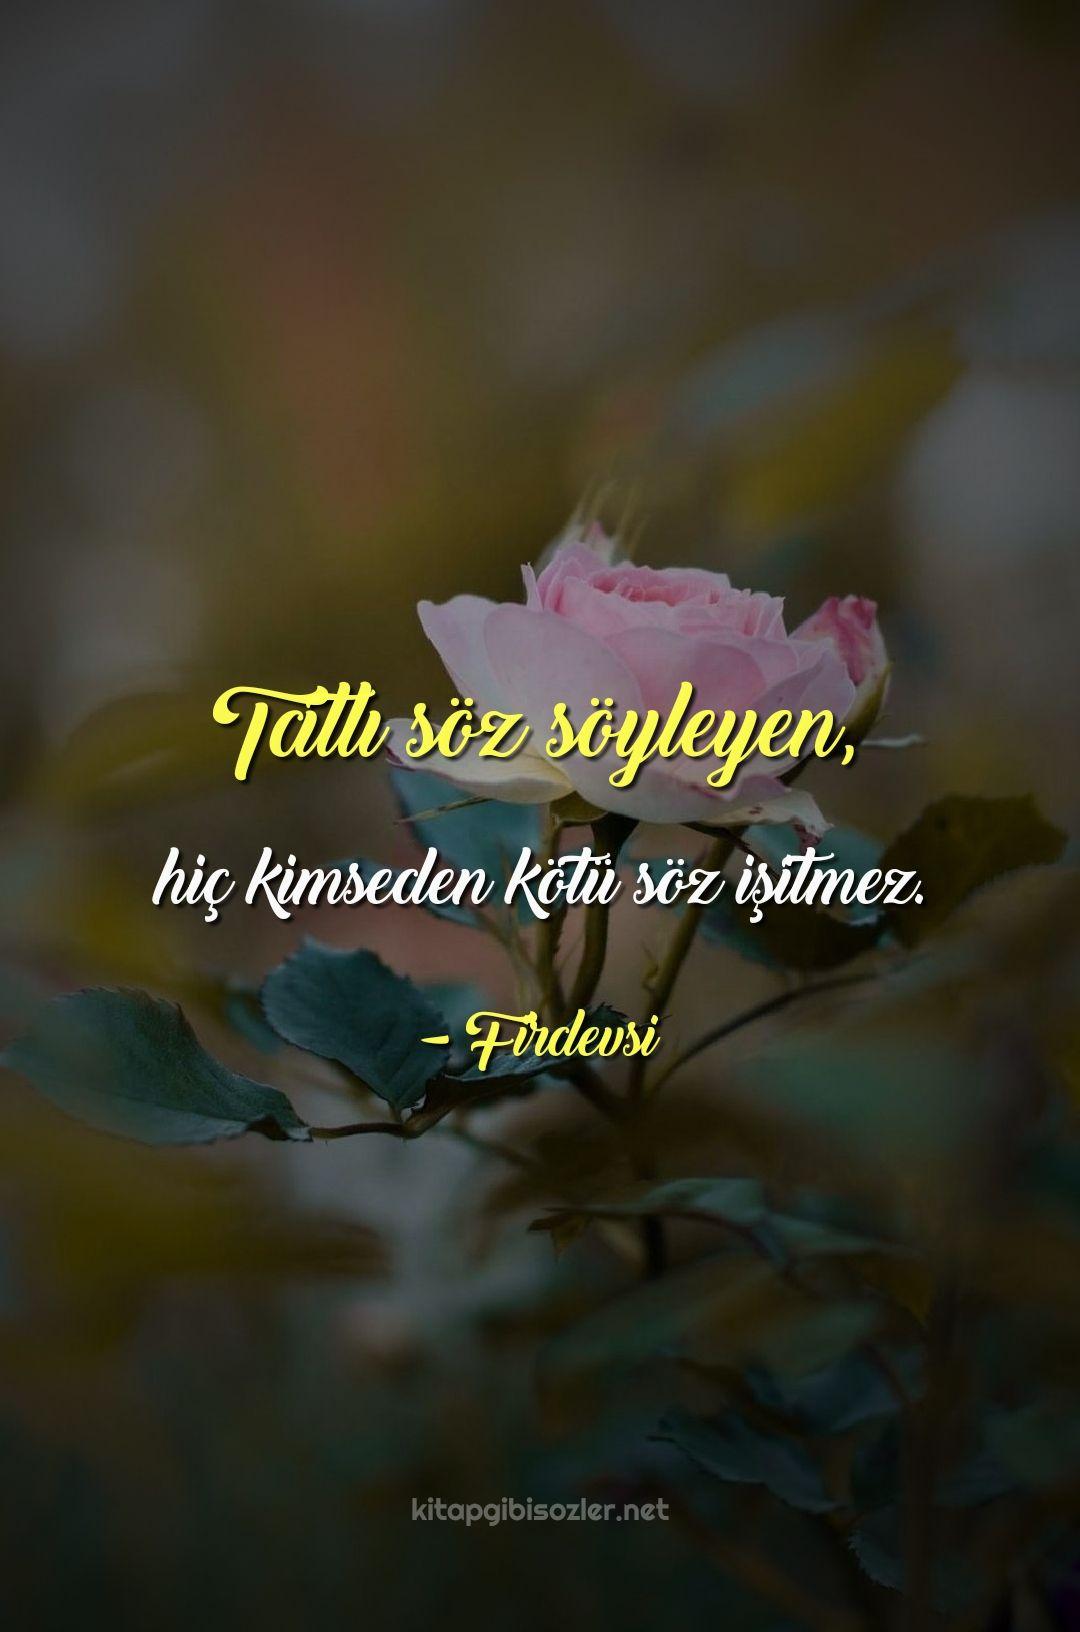 Tatli Soz Soyleyen Hic Kimseden Kotu Soz Isitmez Firdevsi Meaning Of Love Words Word Of The Day